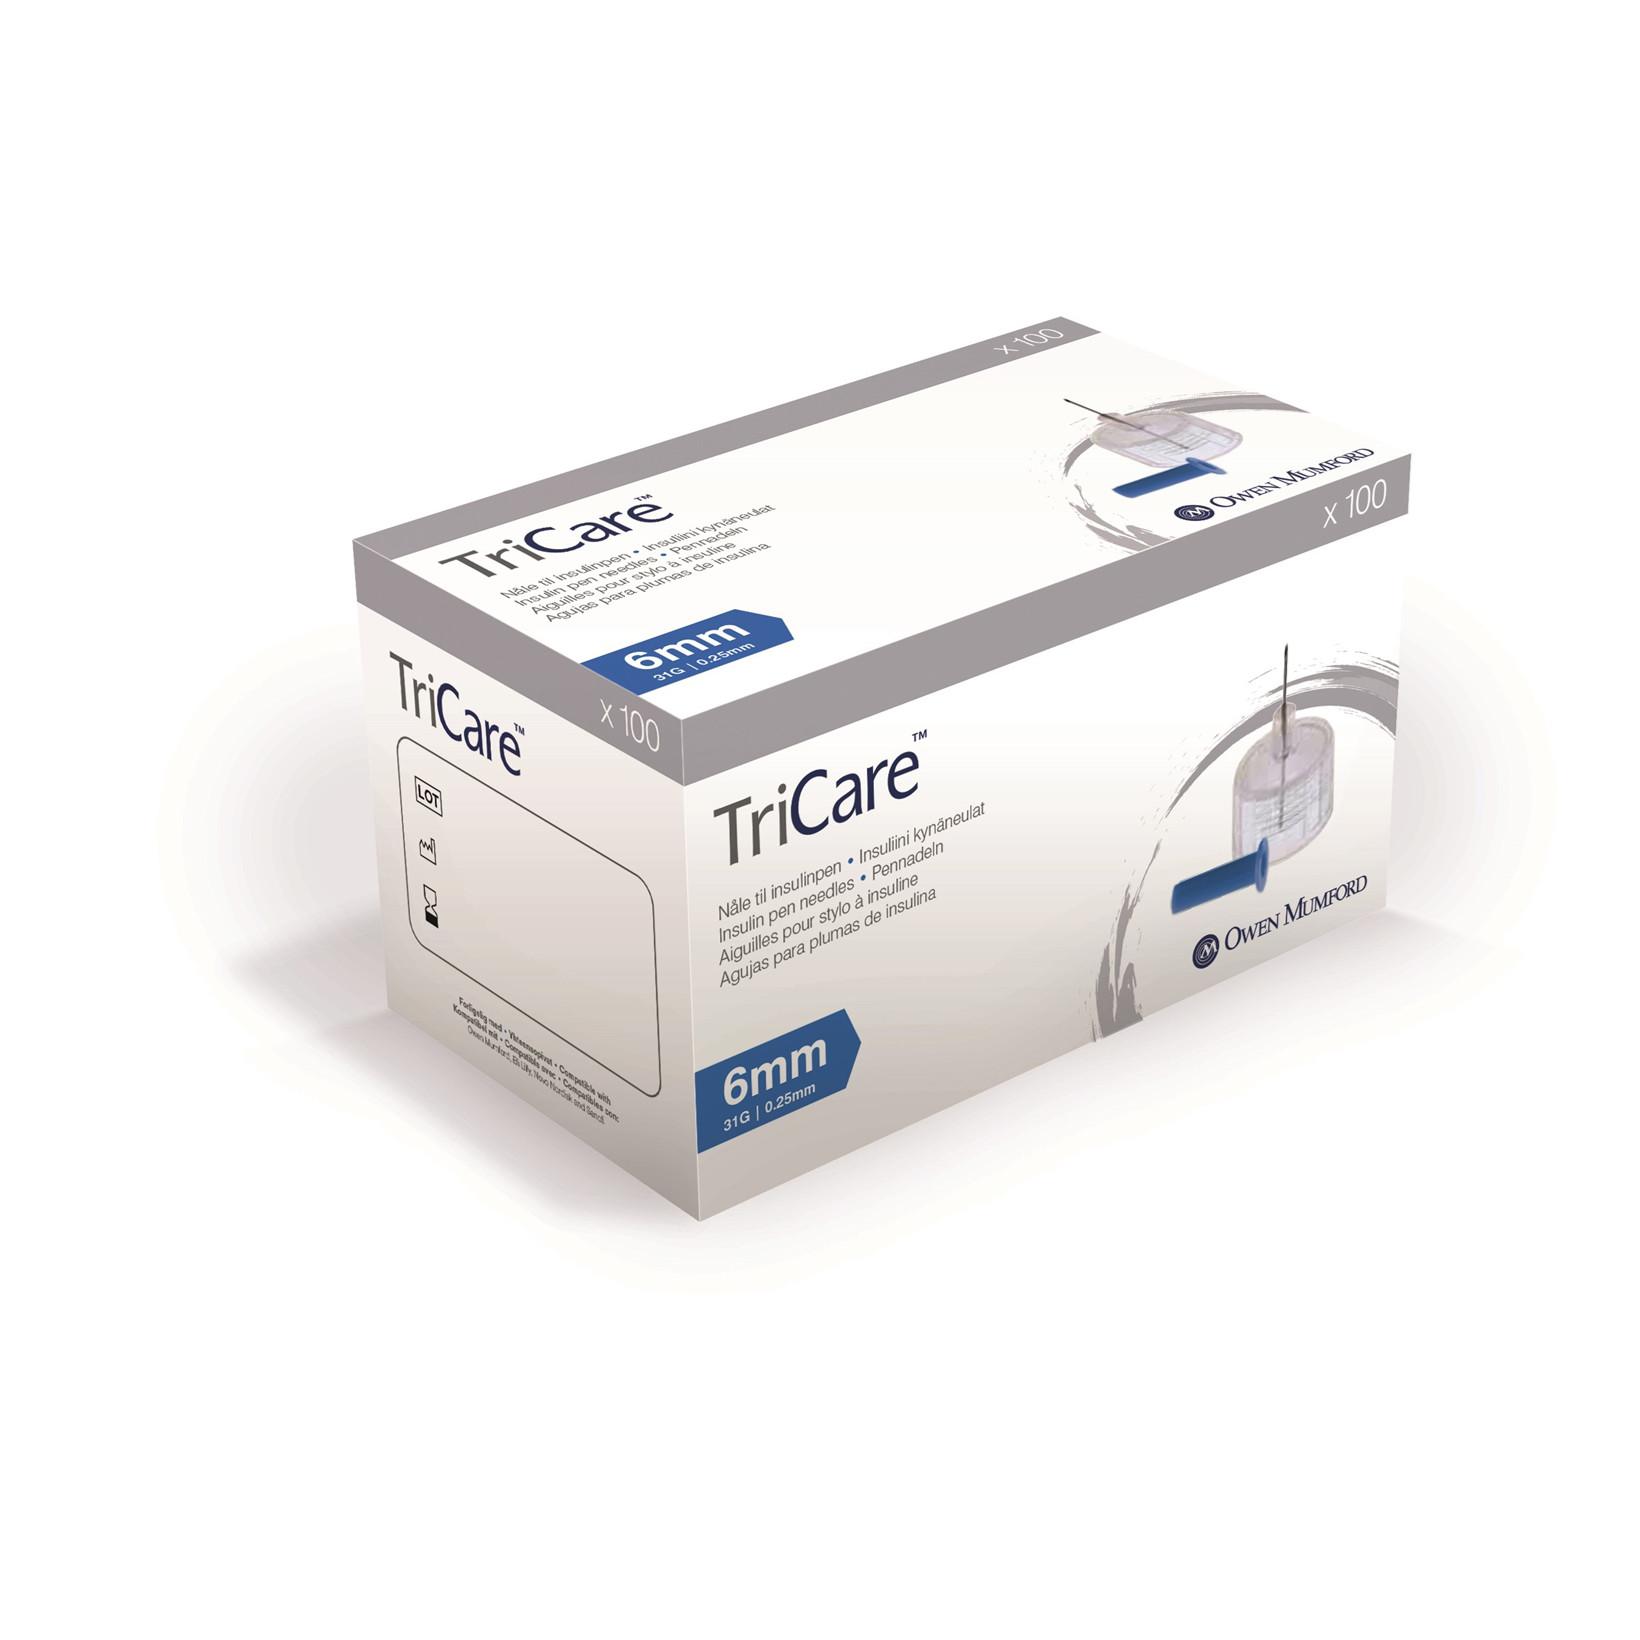 TriCare 0,25 x 6mm 31G penkanyle